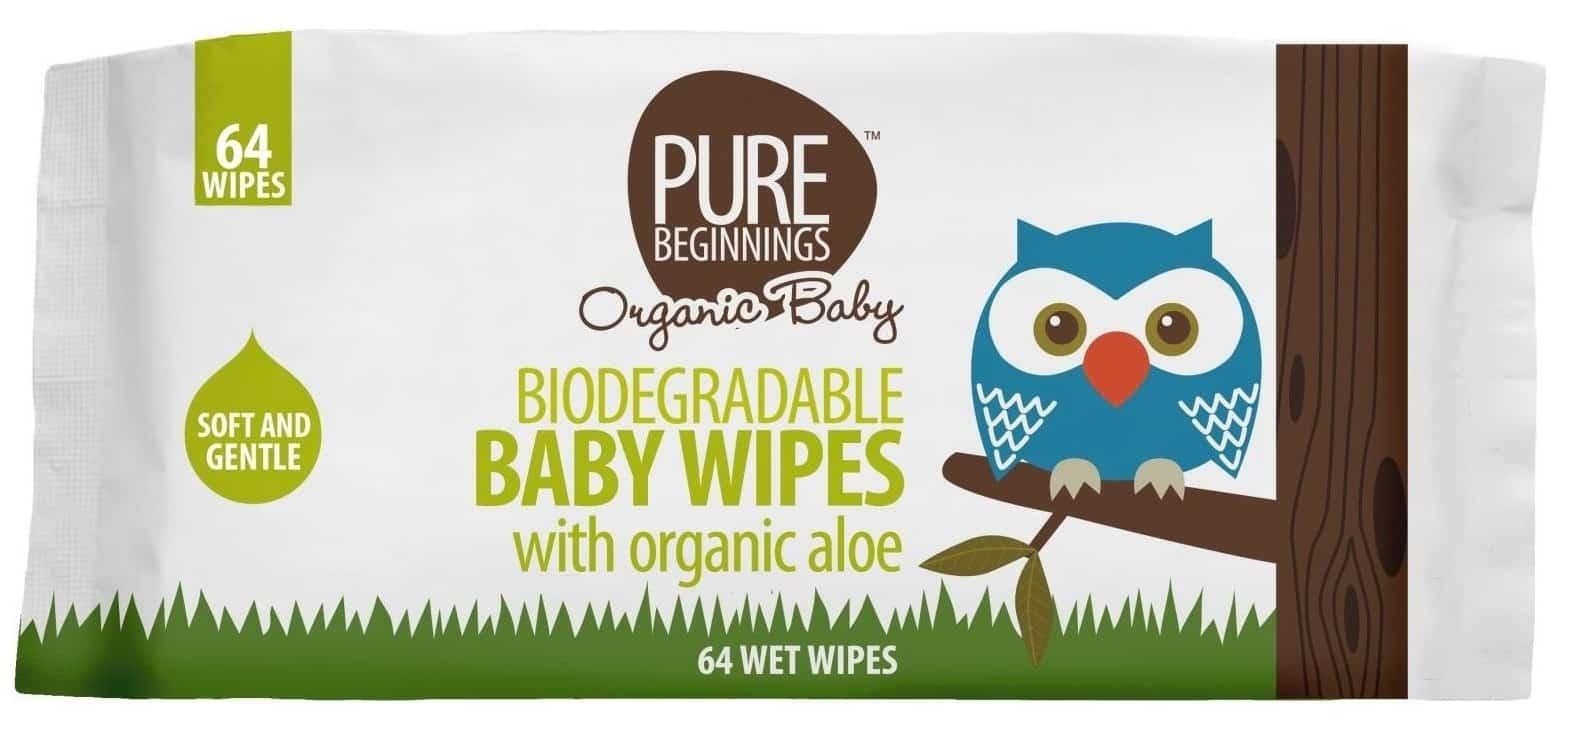 Pure Beginnings PBO, biodegradowalne chusteczki nawilżane, Matka Aptekarka